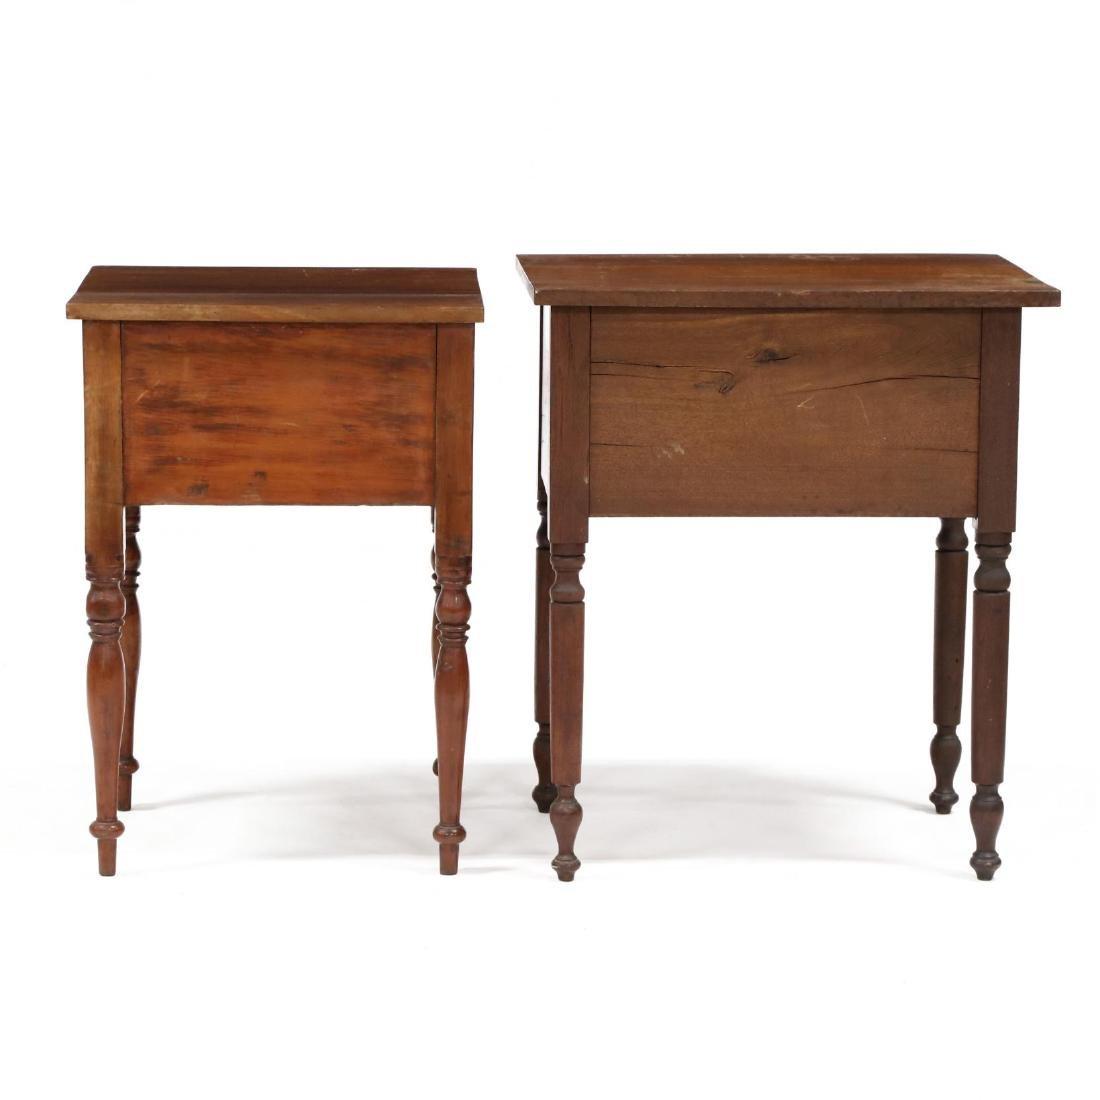 Two Sheraton Walnut Work Tables - 6